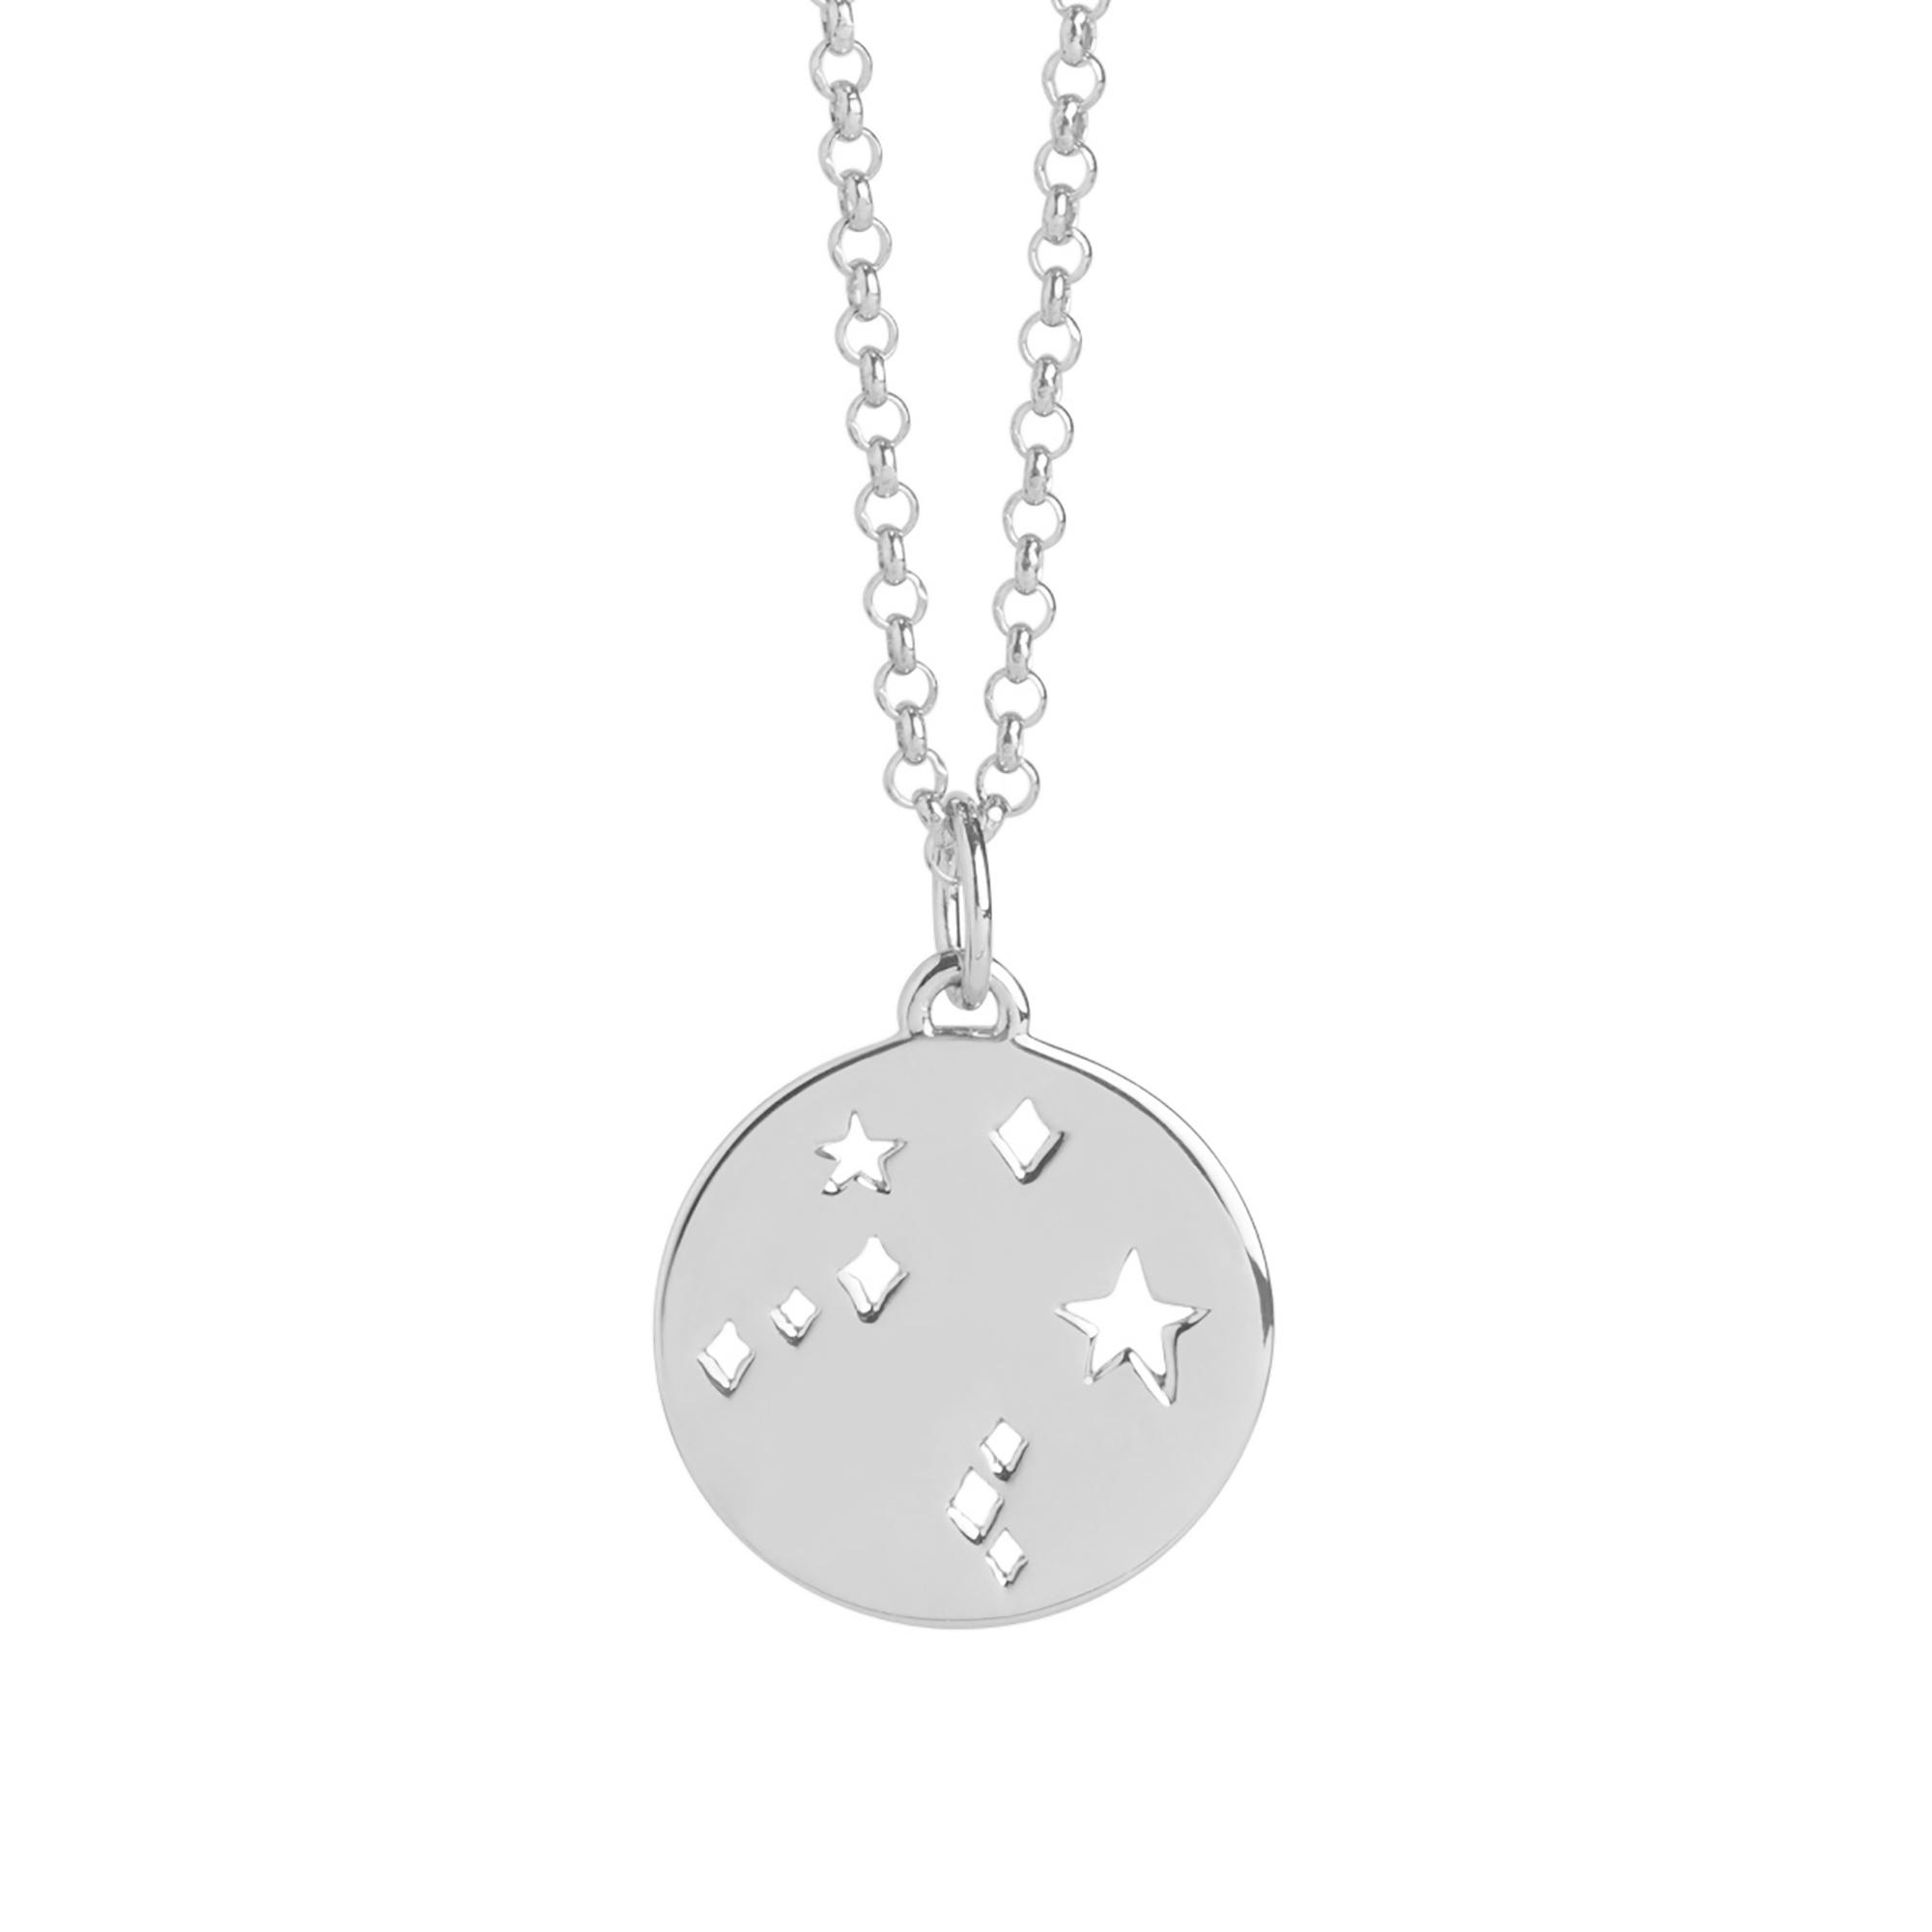 Muru Libra Star Sign Necklace Silver